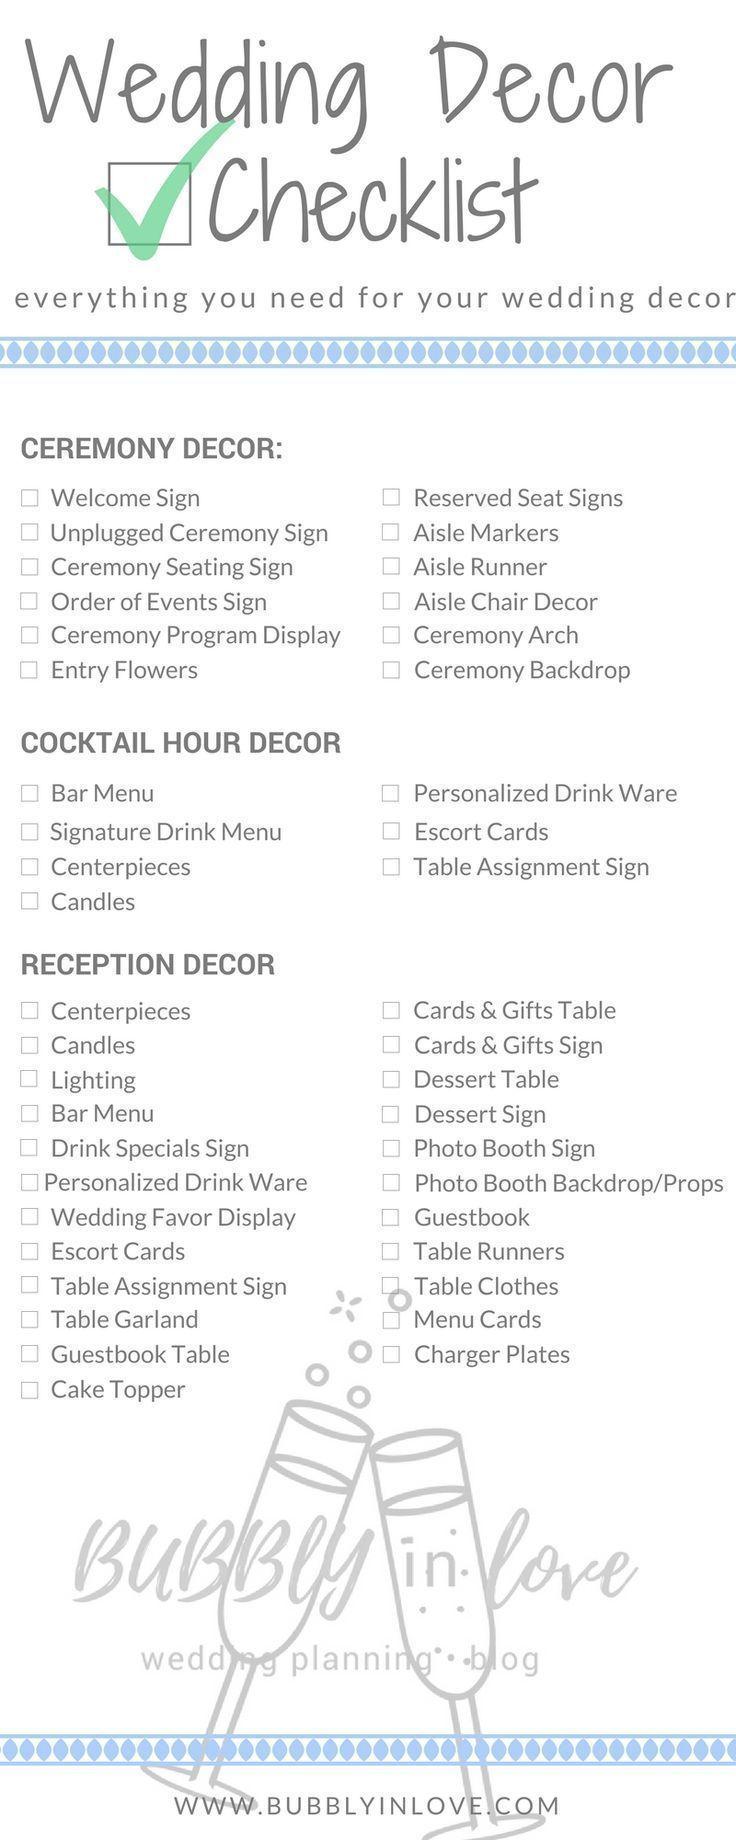 this is so helpful fall wedding casey josh in 2018 wedding